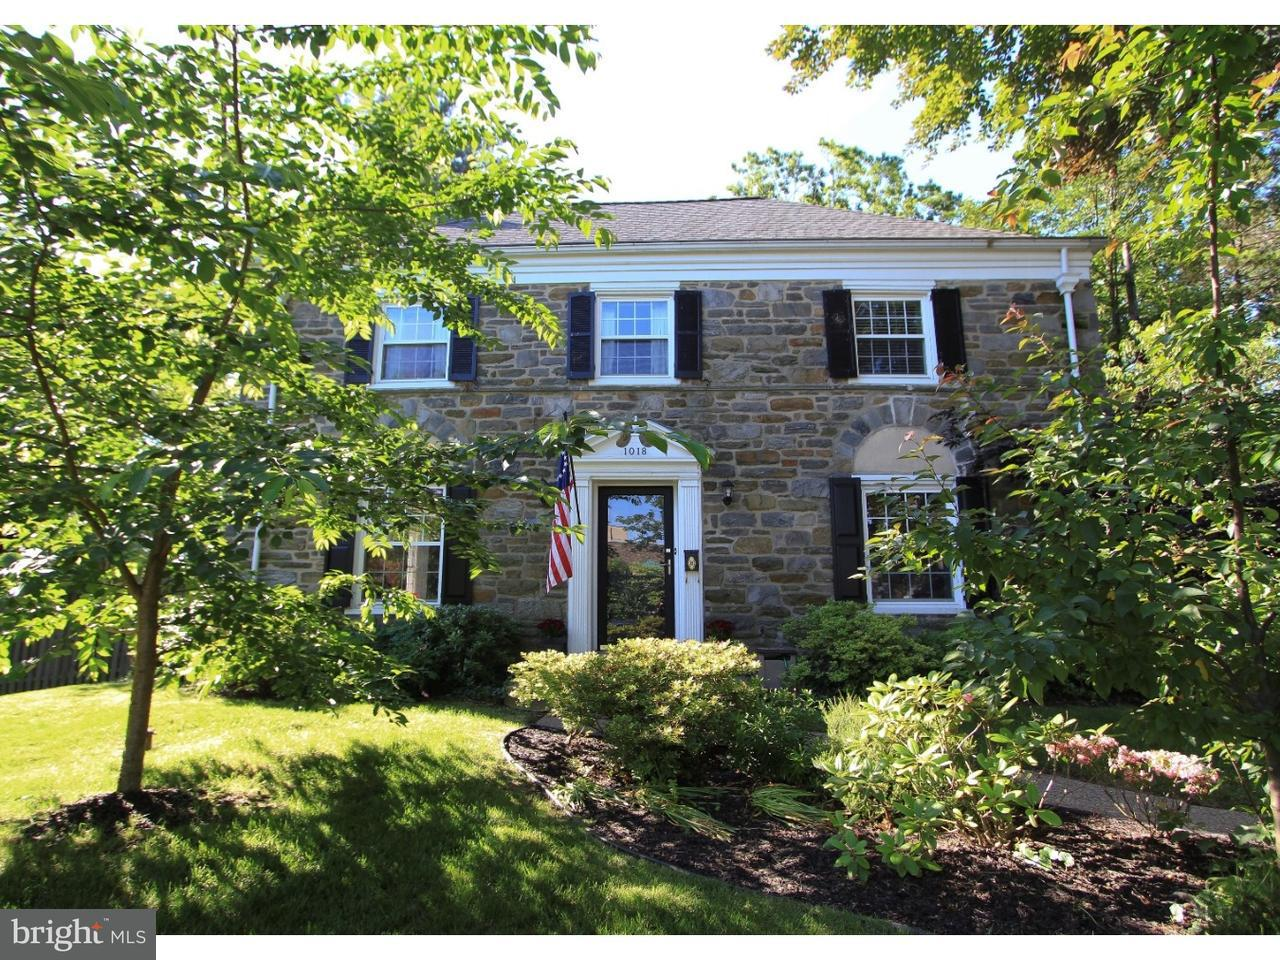 1018  Clover Hill Wynnewood, PA 19096